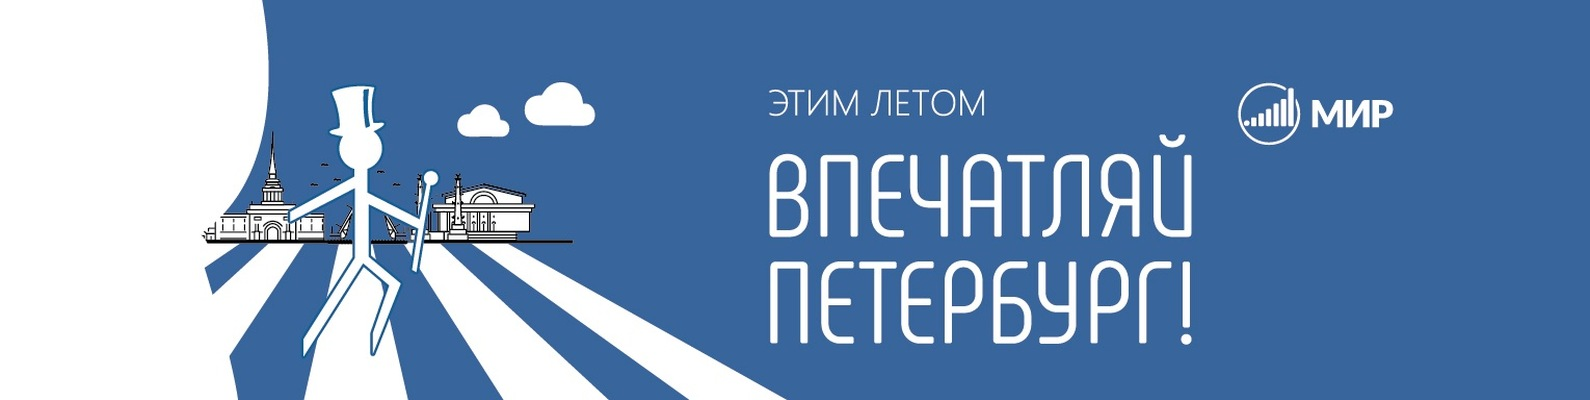 Впечатляй Петербург